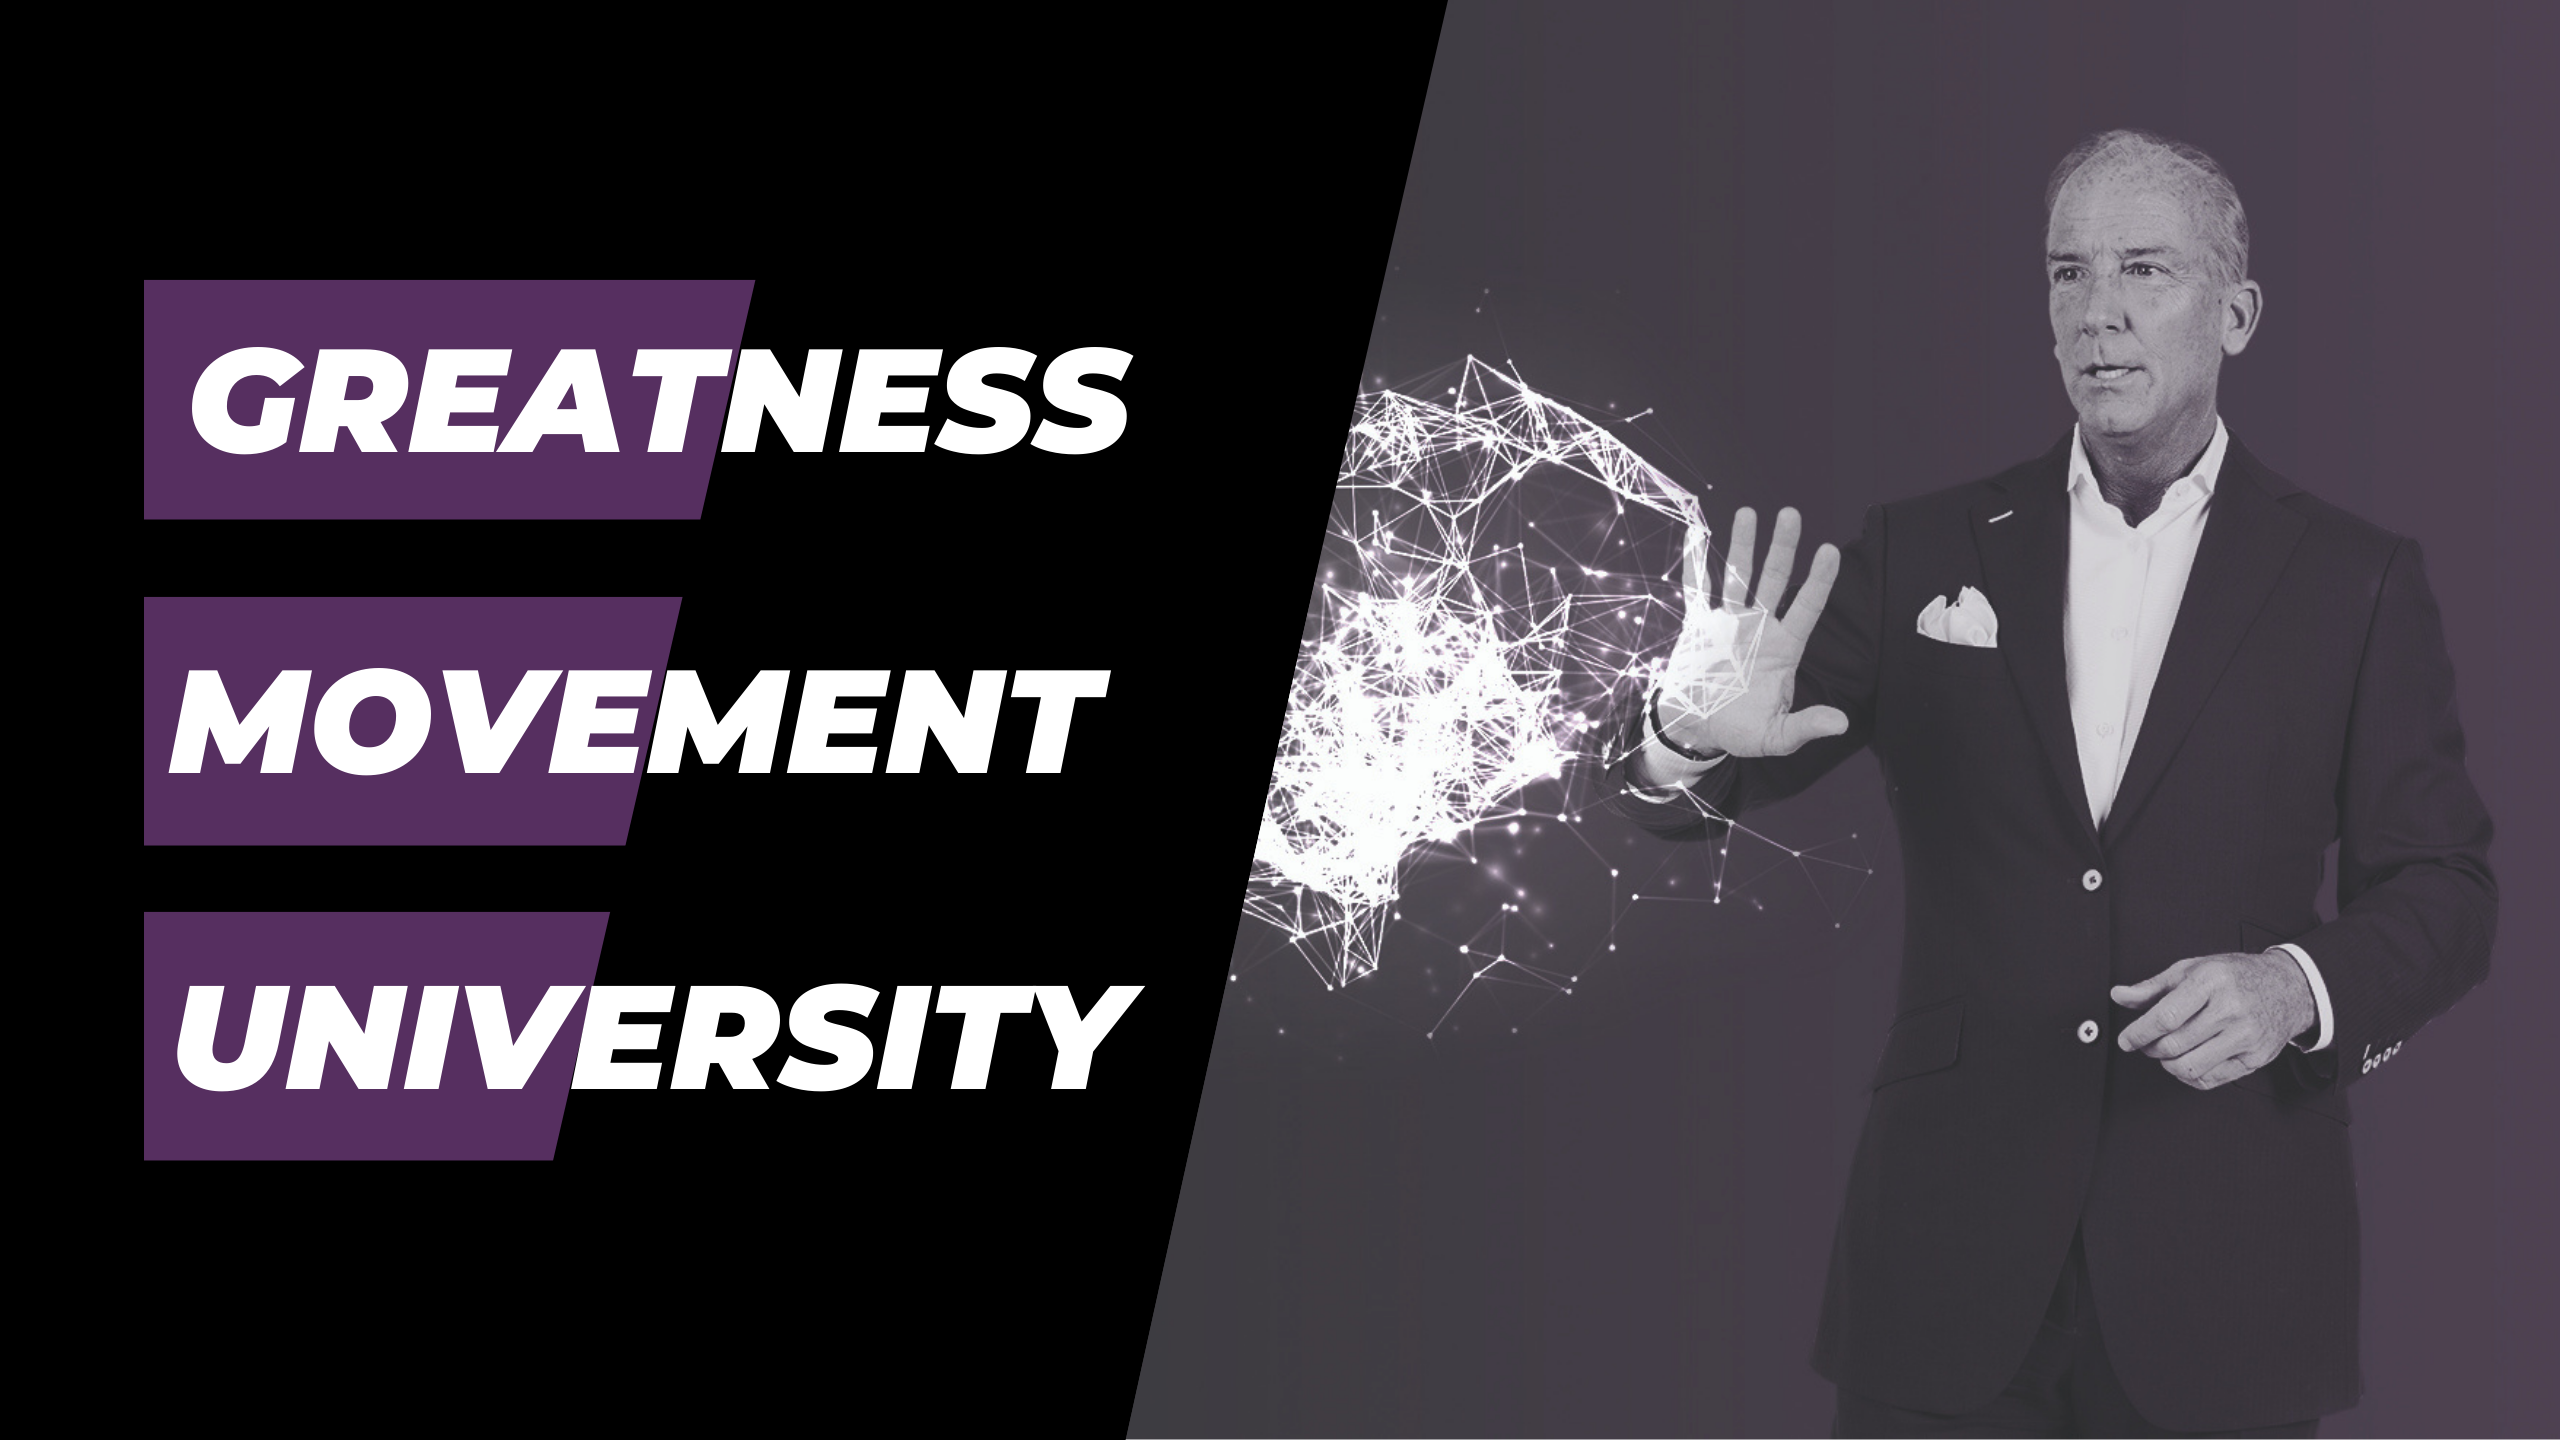 Greatness Movement University